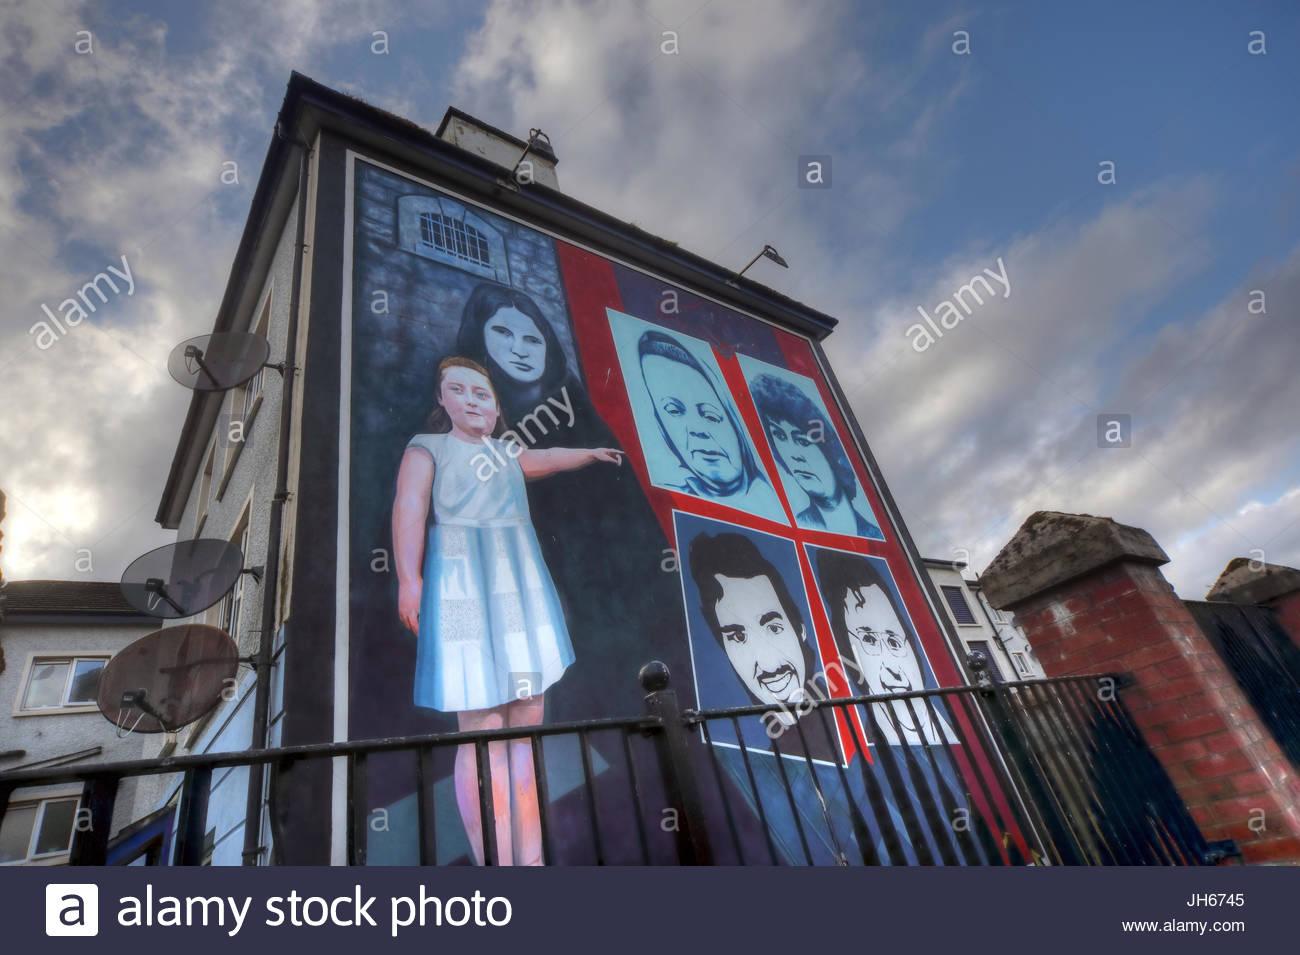 Irish,Bogside,Troubles,Political,NorthernIreland,tourist,Tourism,Struggle,DerryCity,Peace,Art,Culture,violence,fighter,painting,Bogside Mural,Bogsidemural,colour,gotonysmith,Sunday Bloody Sunday,SundayBloodySunday